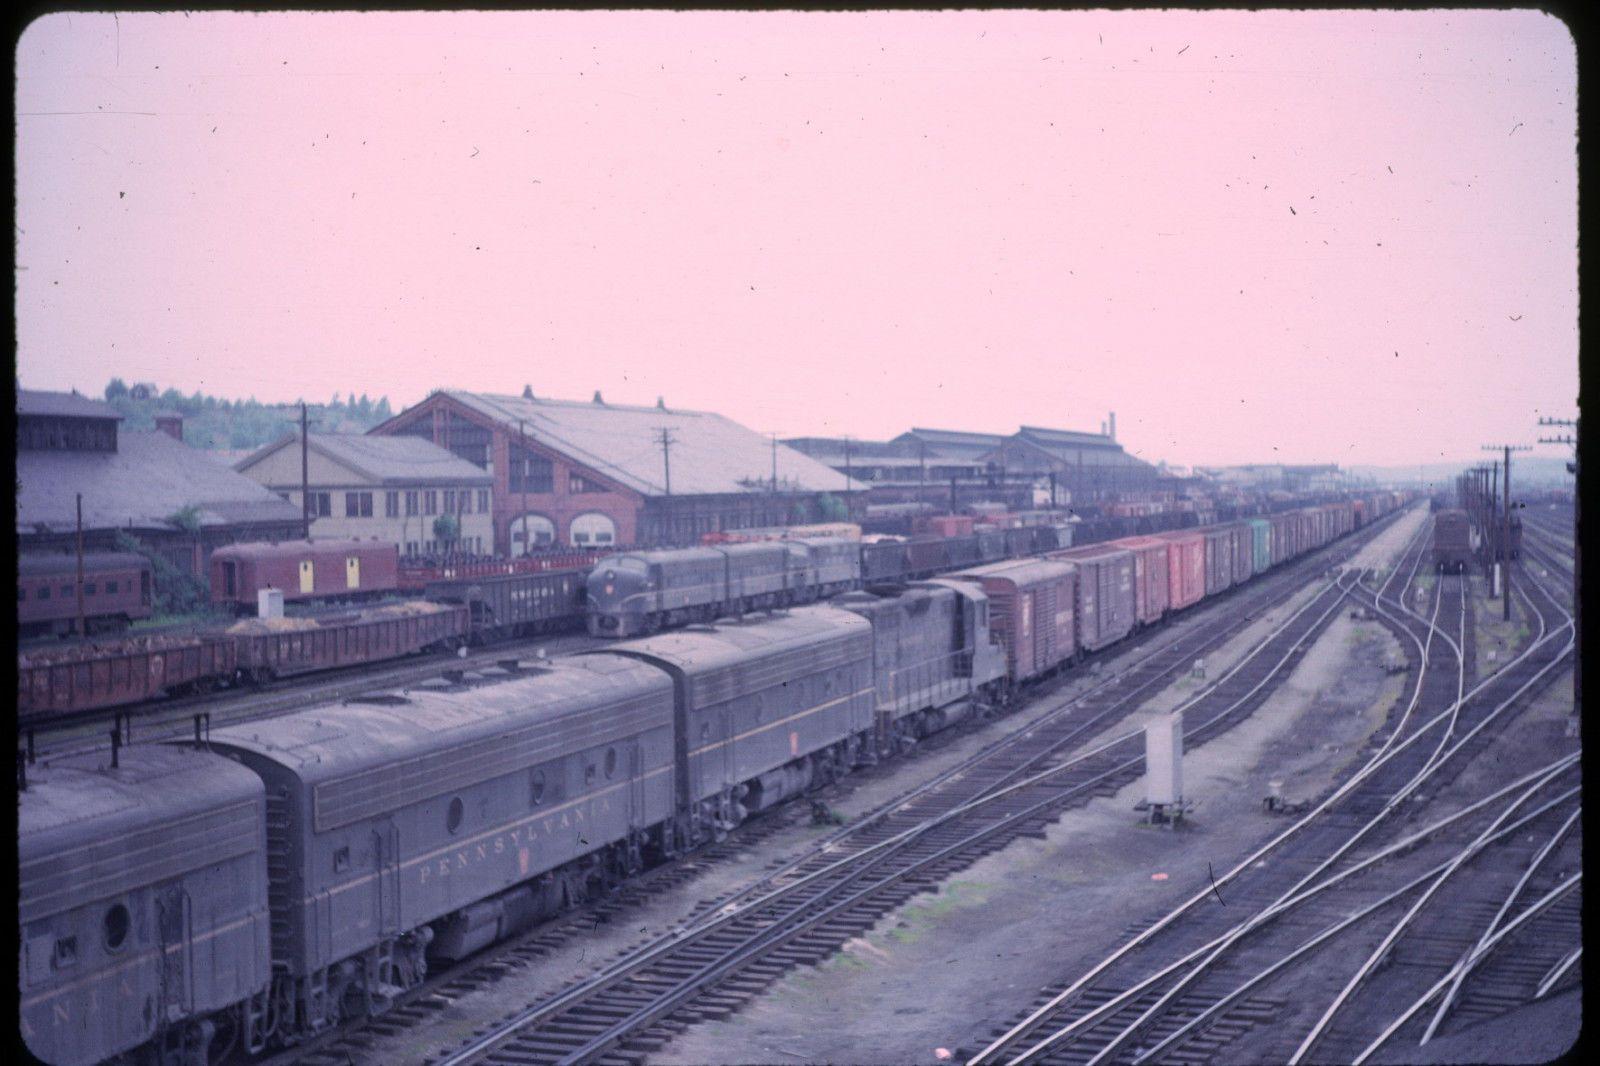 Pennsylvania Railroad Shops And Yard About 1960 Railroad